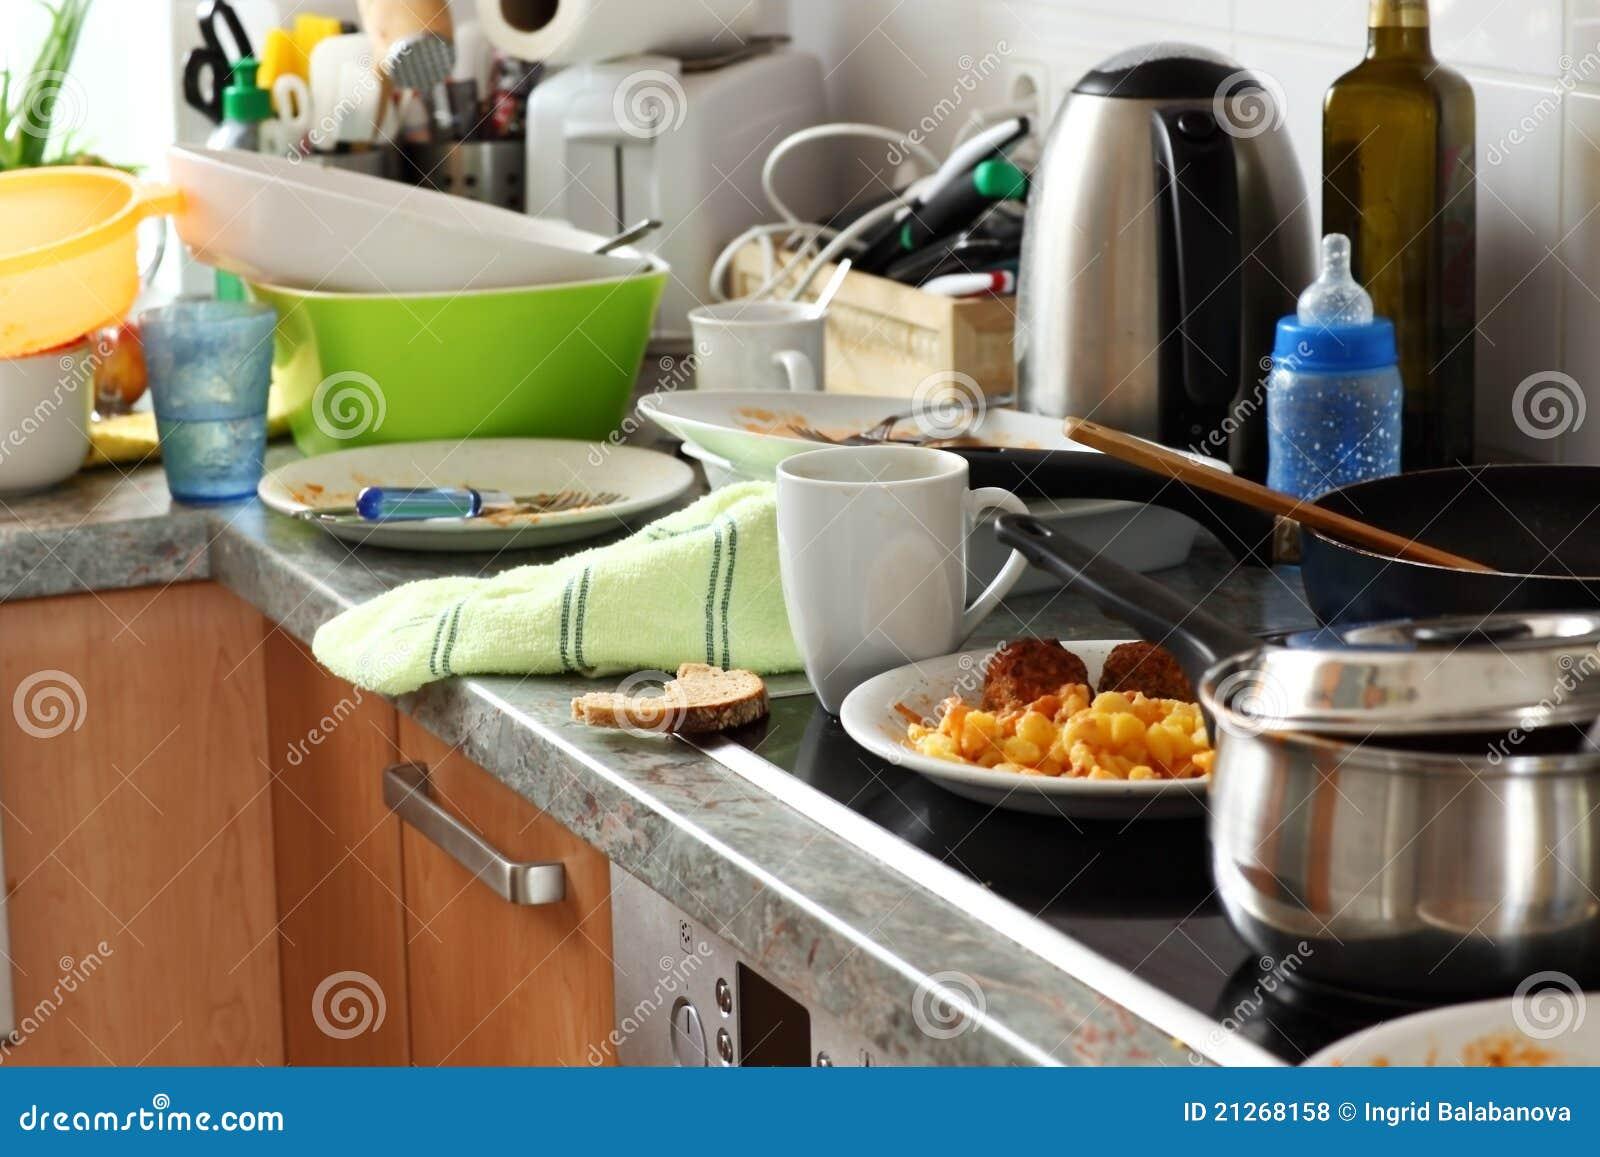 Dirty kitchen stock photo image of dish plates metal - Feng shui limpiar casa malas energias ...